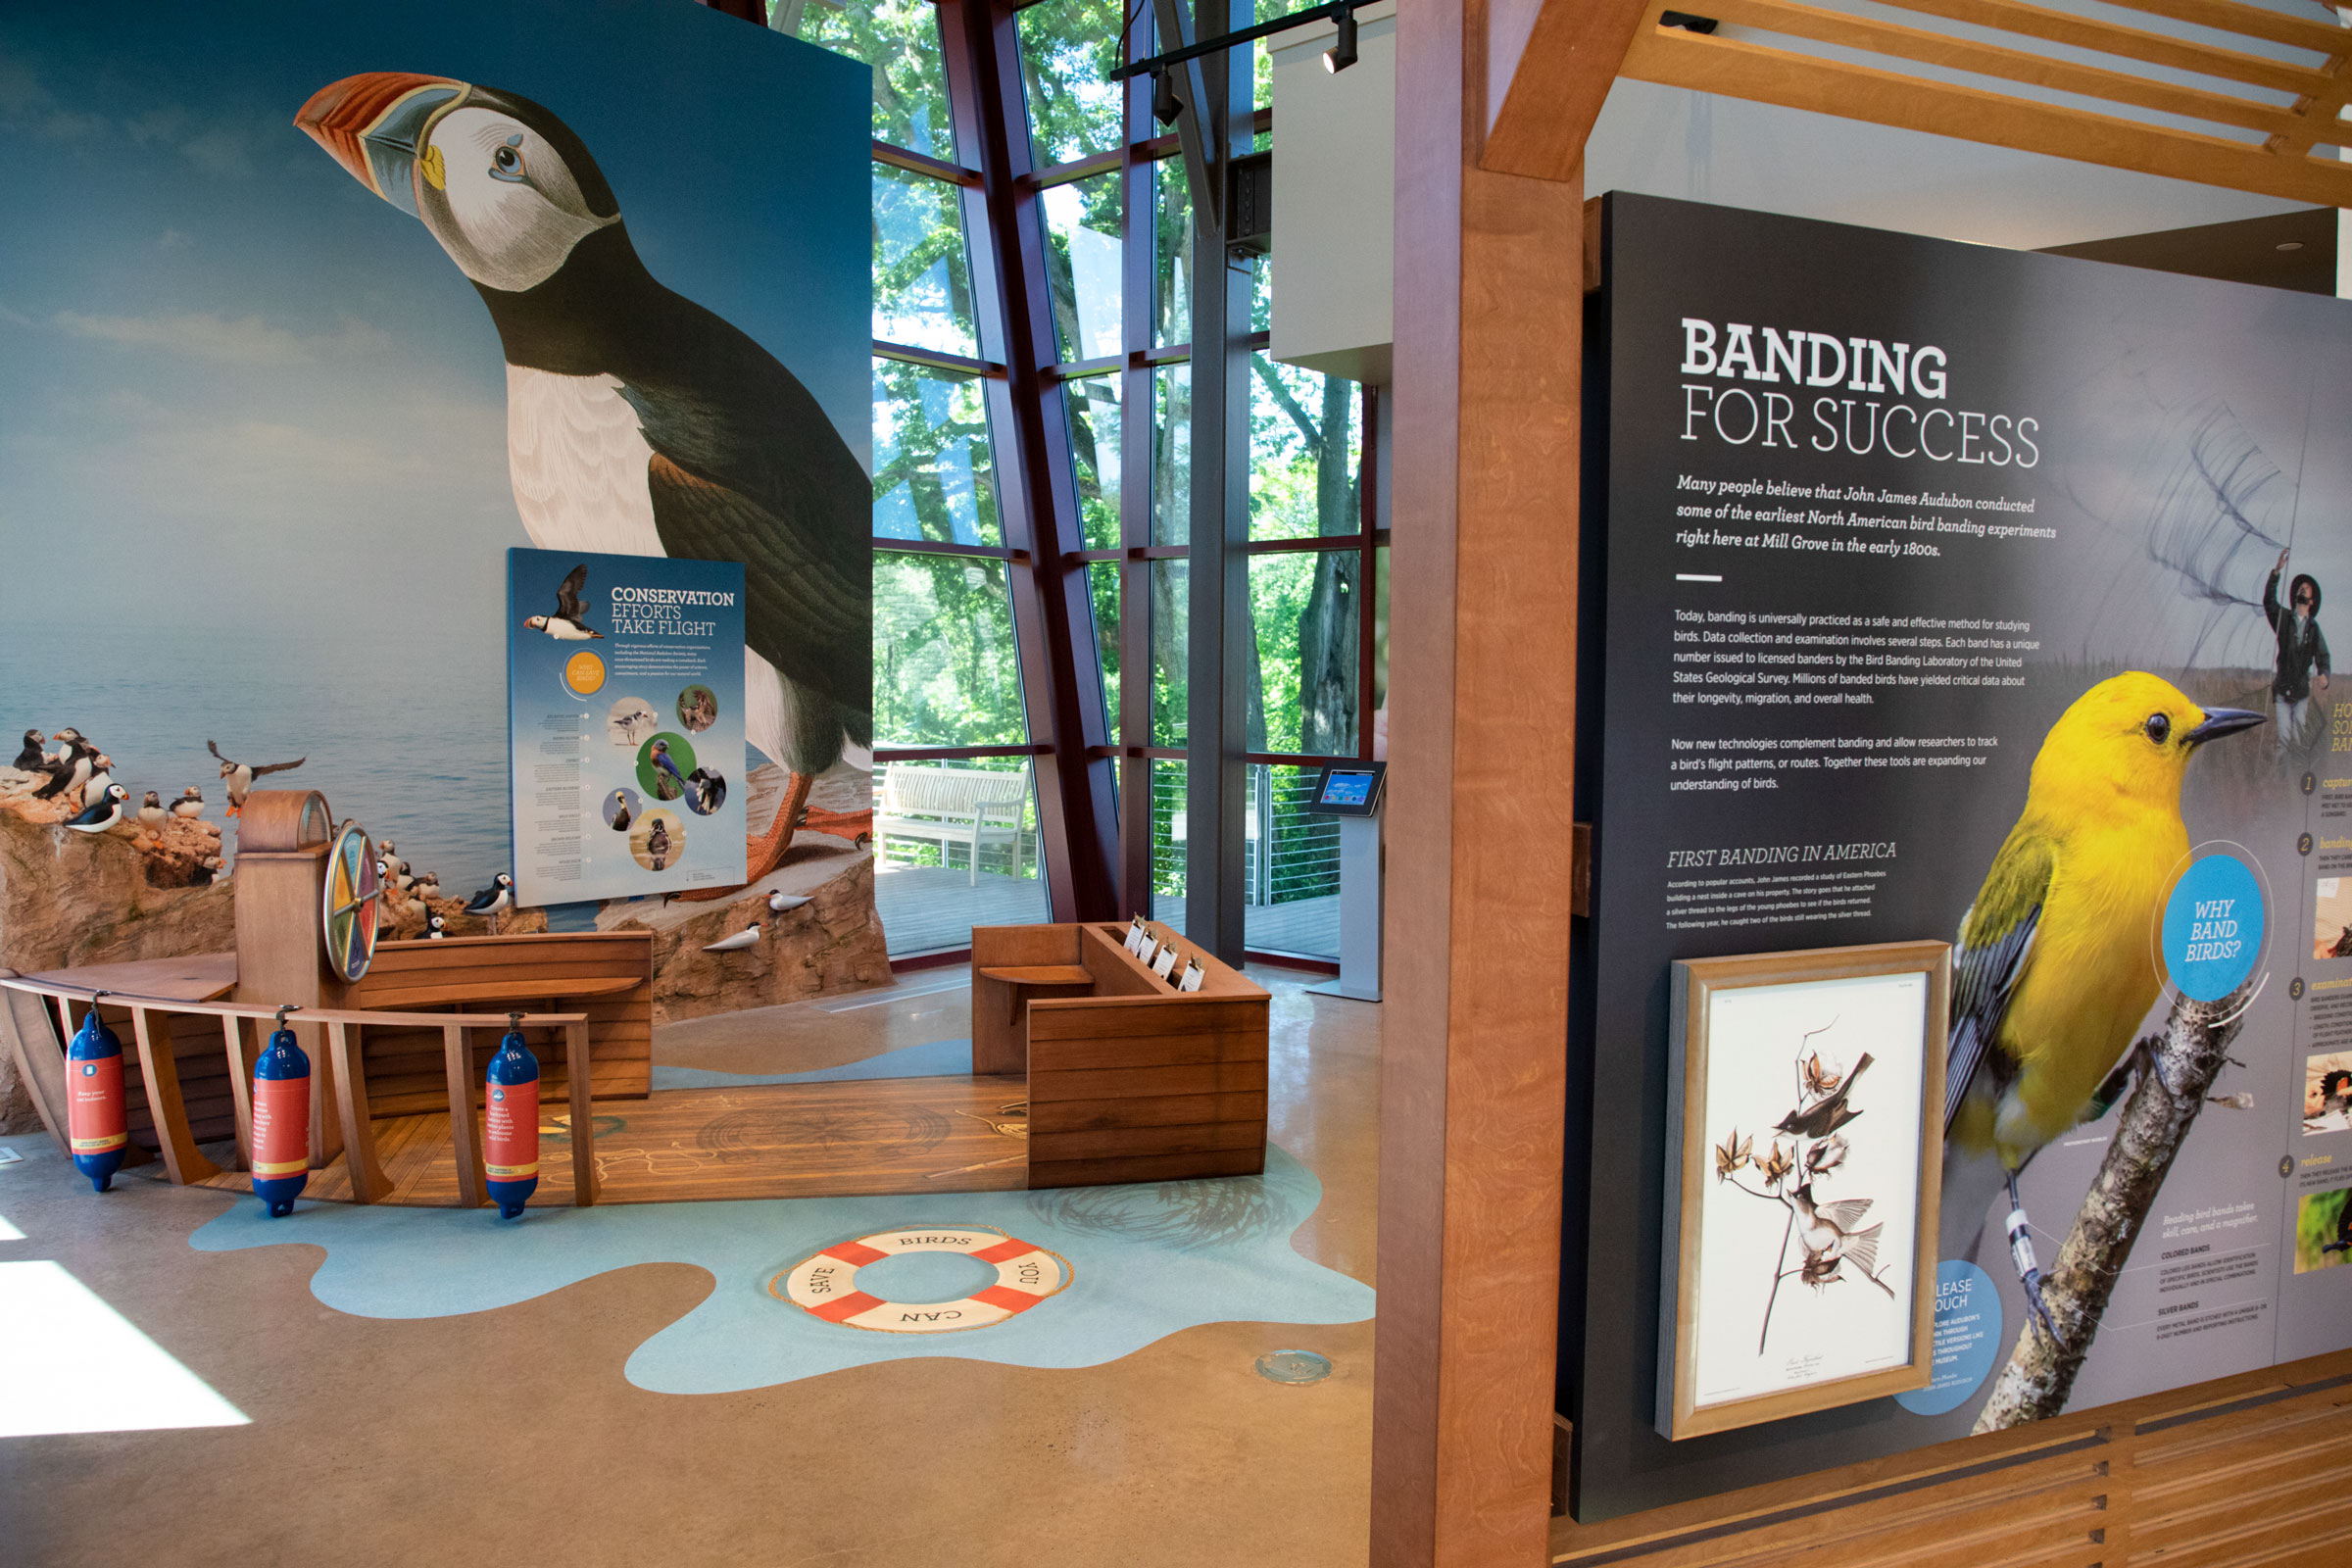 The Conservation Gallery highlights Audubon's Seabird Restoration Program and Project Puffin at the John James Audubon Center at Mill Grove on Tuesday, June 4, 2019 in Audubon, Pennsylvania. Luke Franke/Audubon